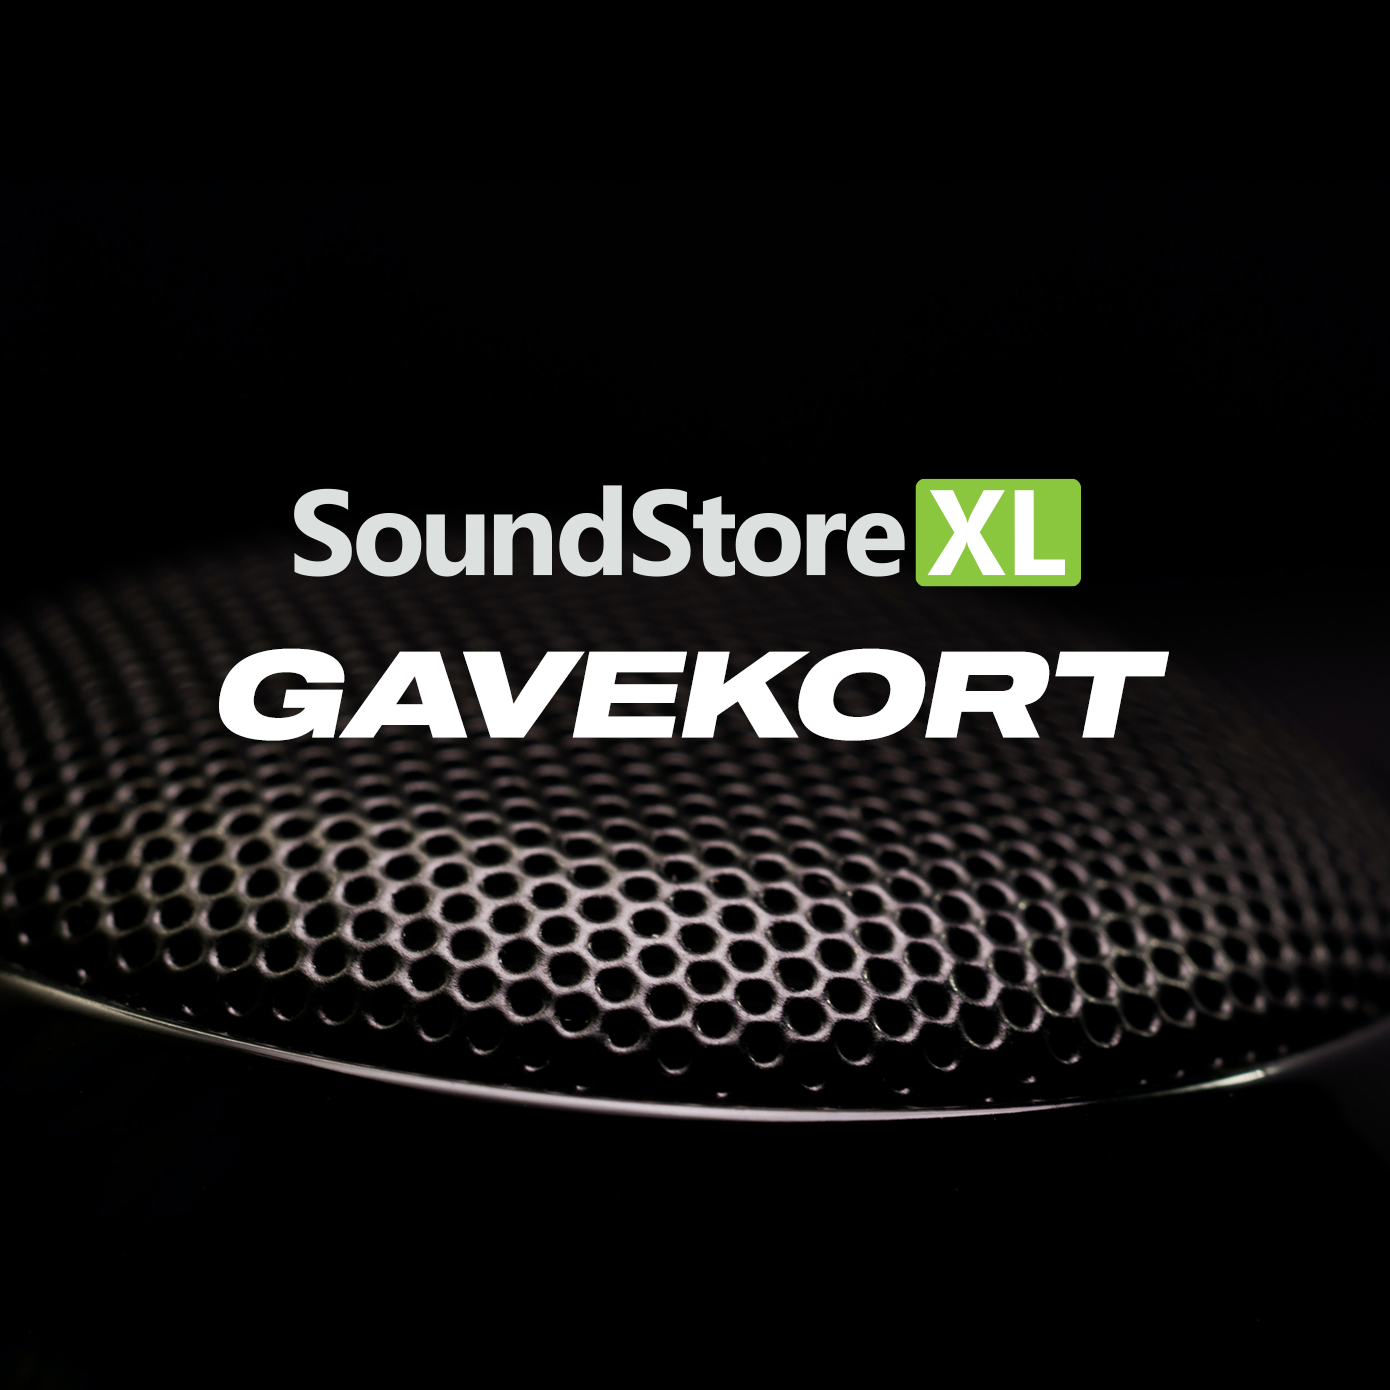 SoundStoreXL Gavekort (e-mail)